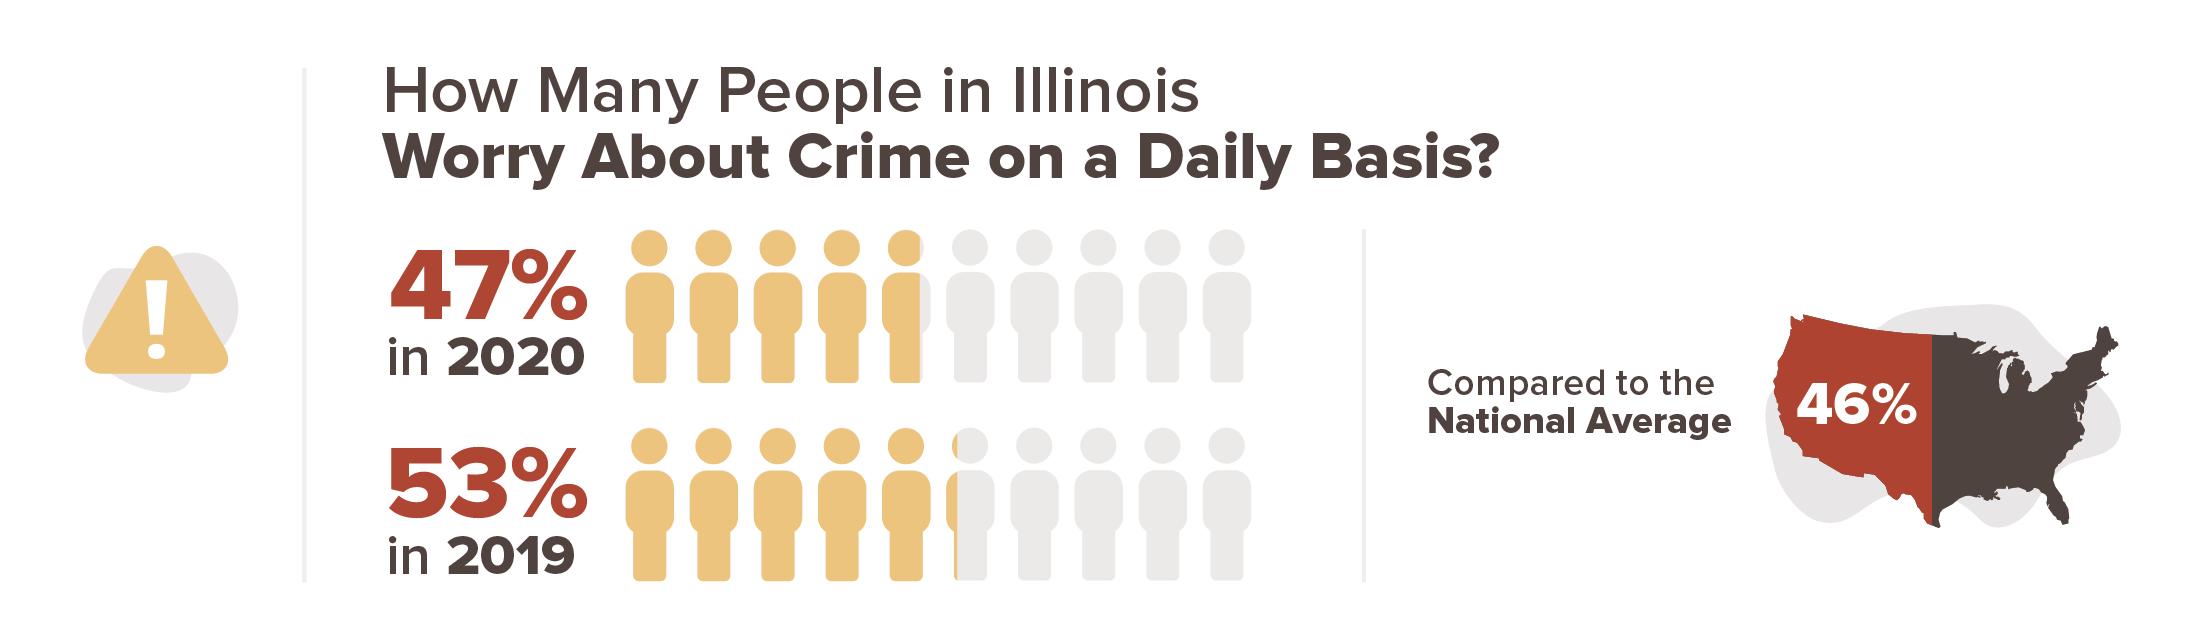 Illinois crime statistics infographic